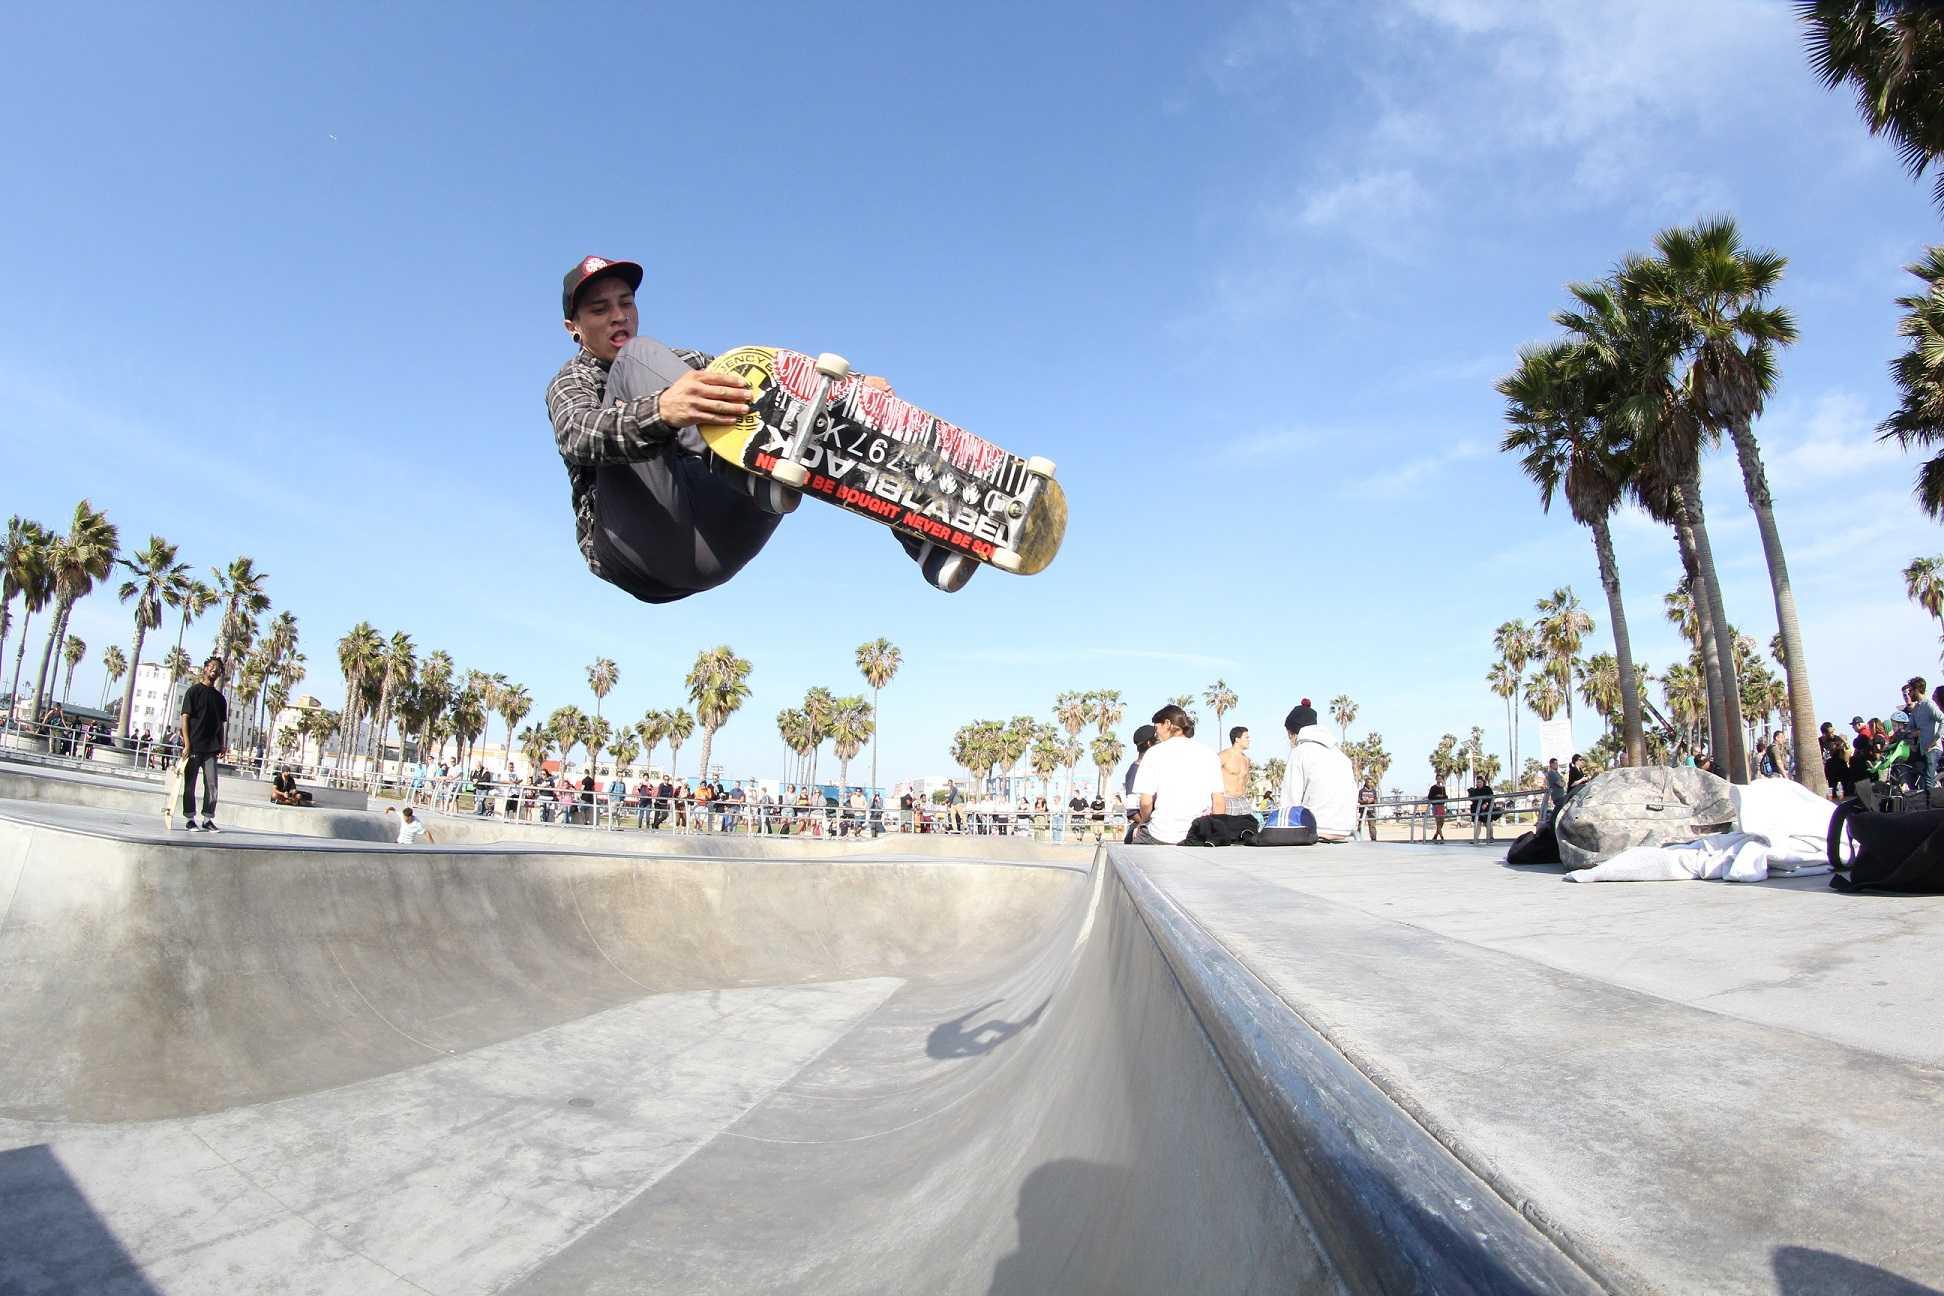 Skateboarders and sponsors: highlighting Timothy Misagal